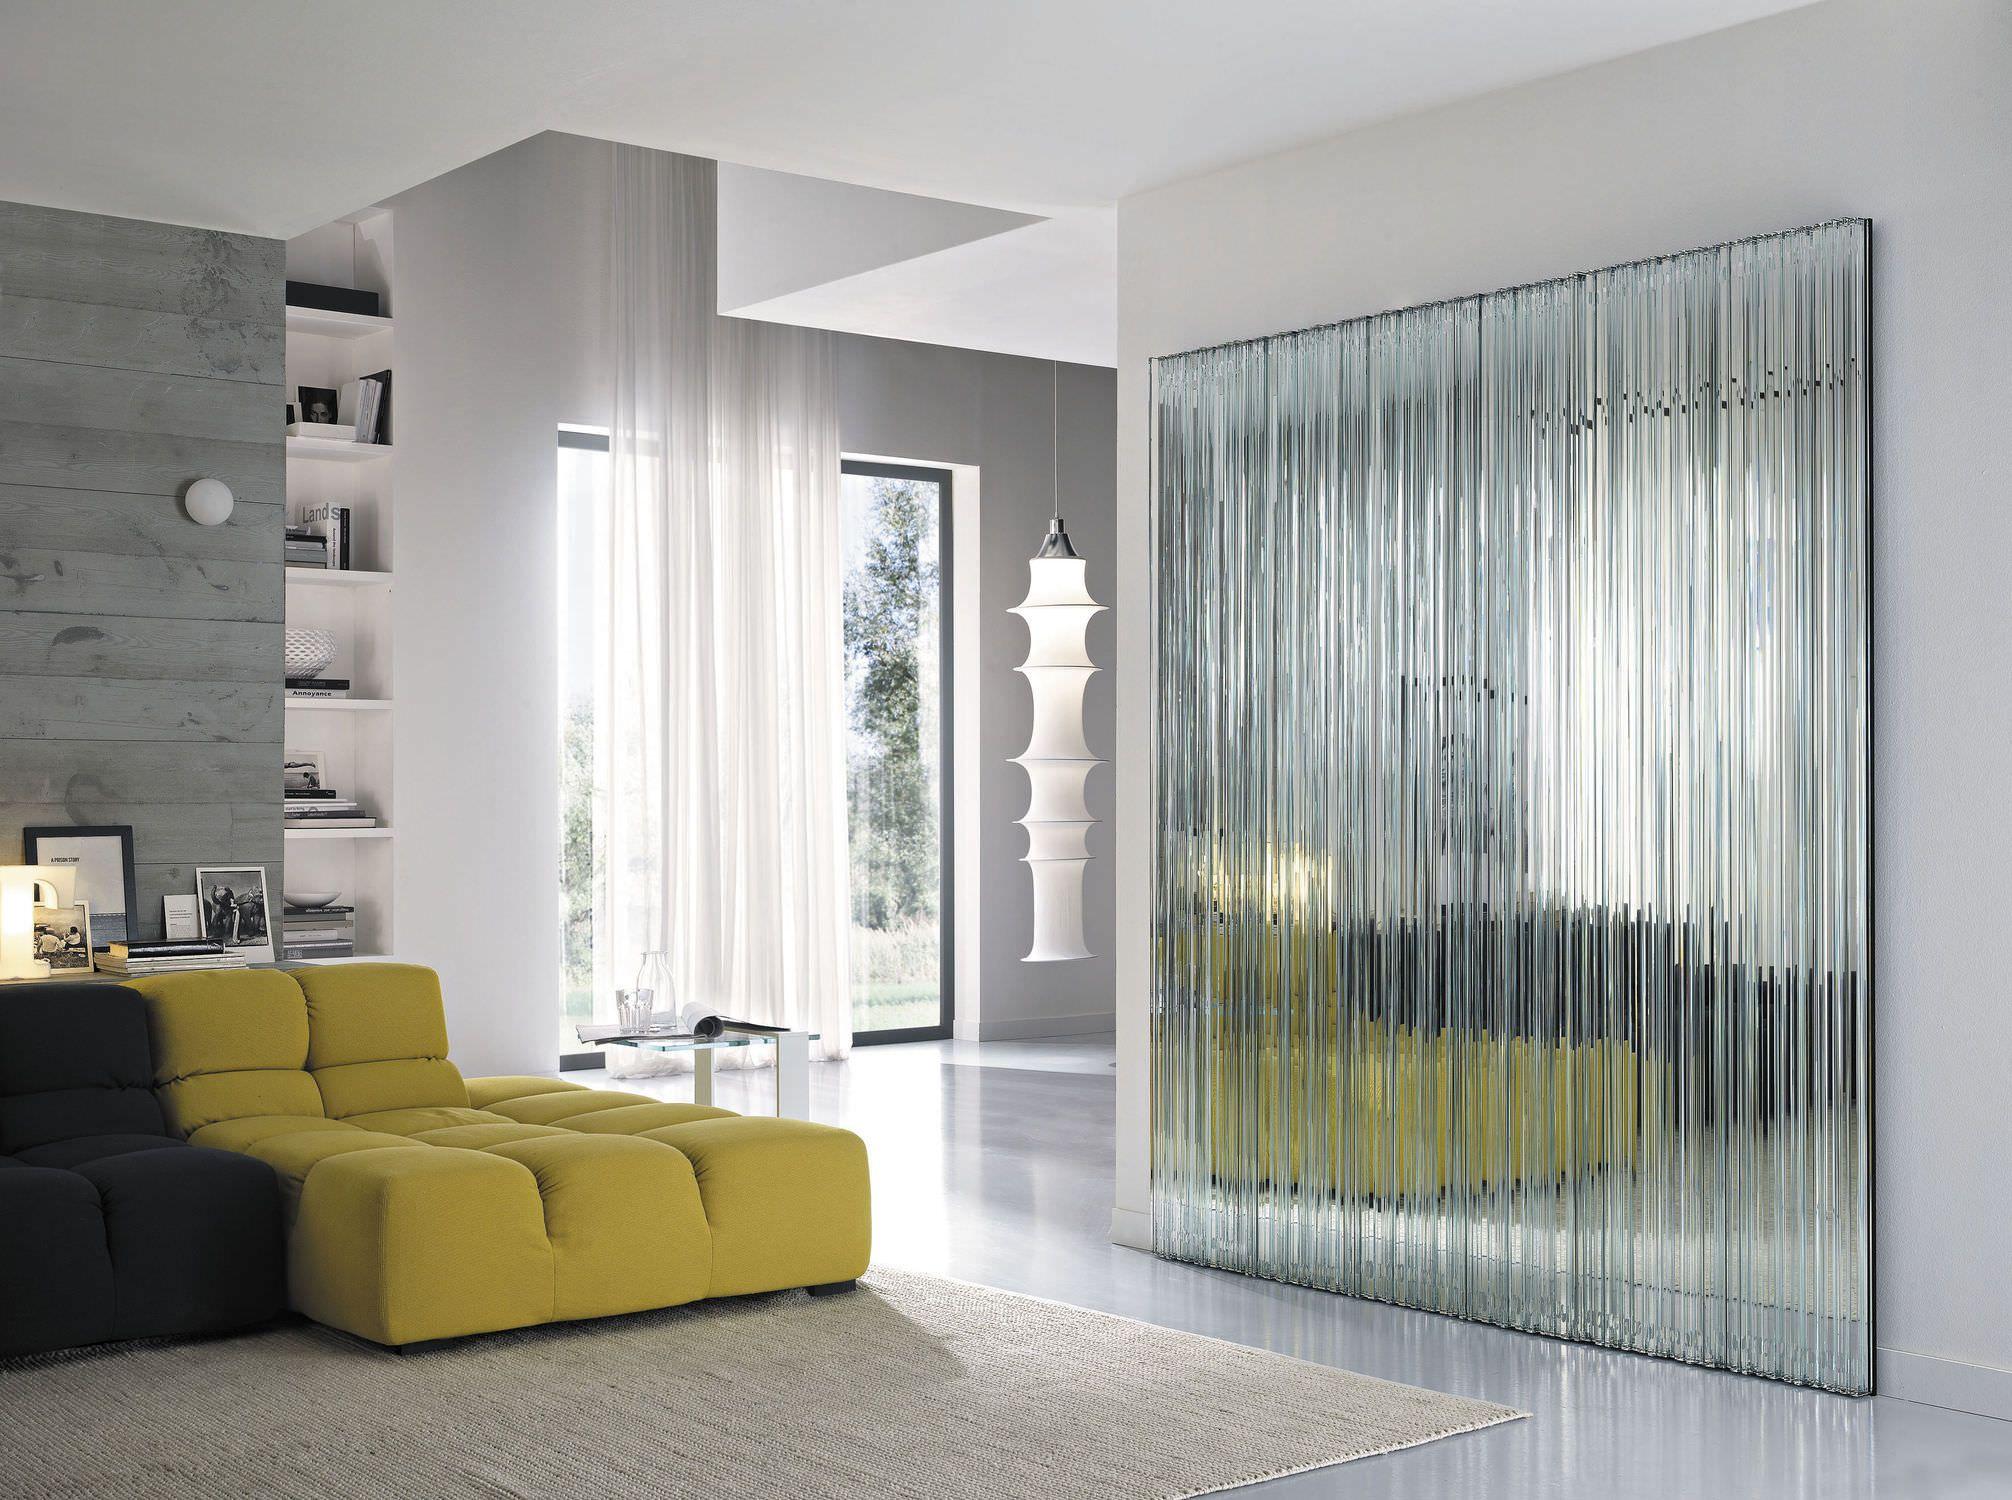 miroir mural contemporain carr vu by g t garattoni. Black Bedroom Furniture Sets. Home Design Ideas